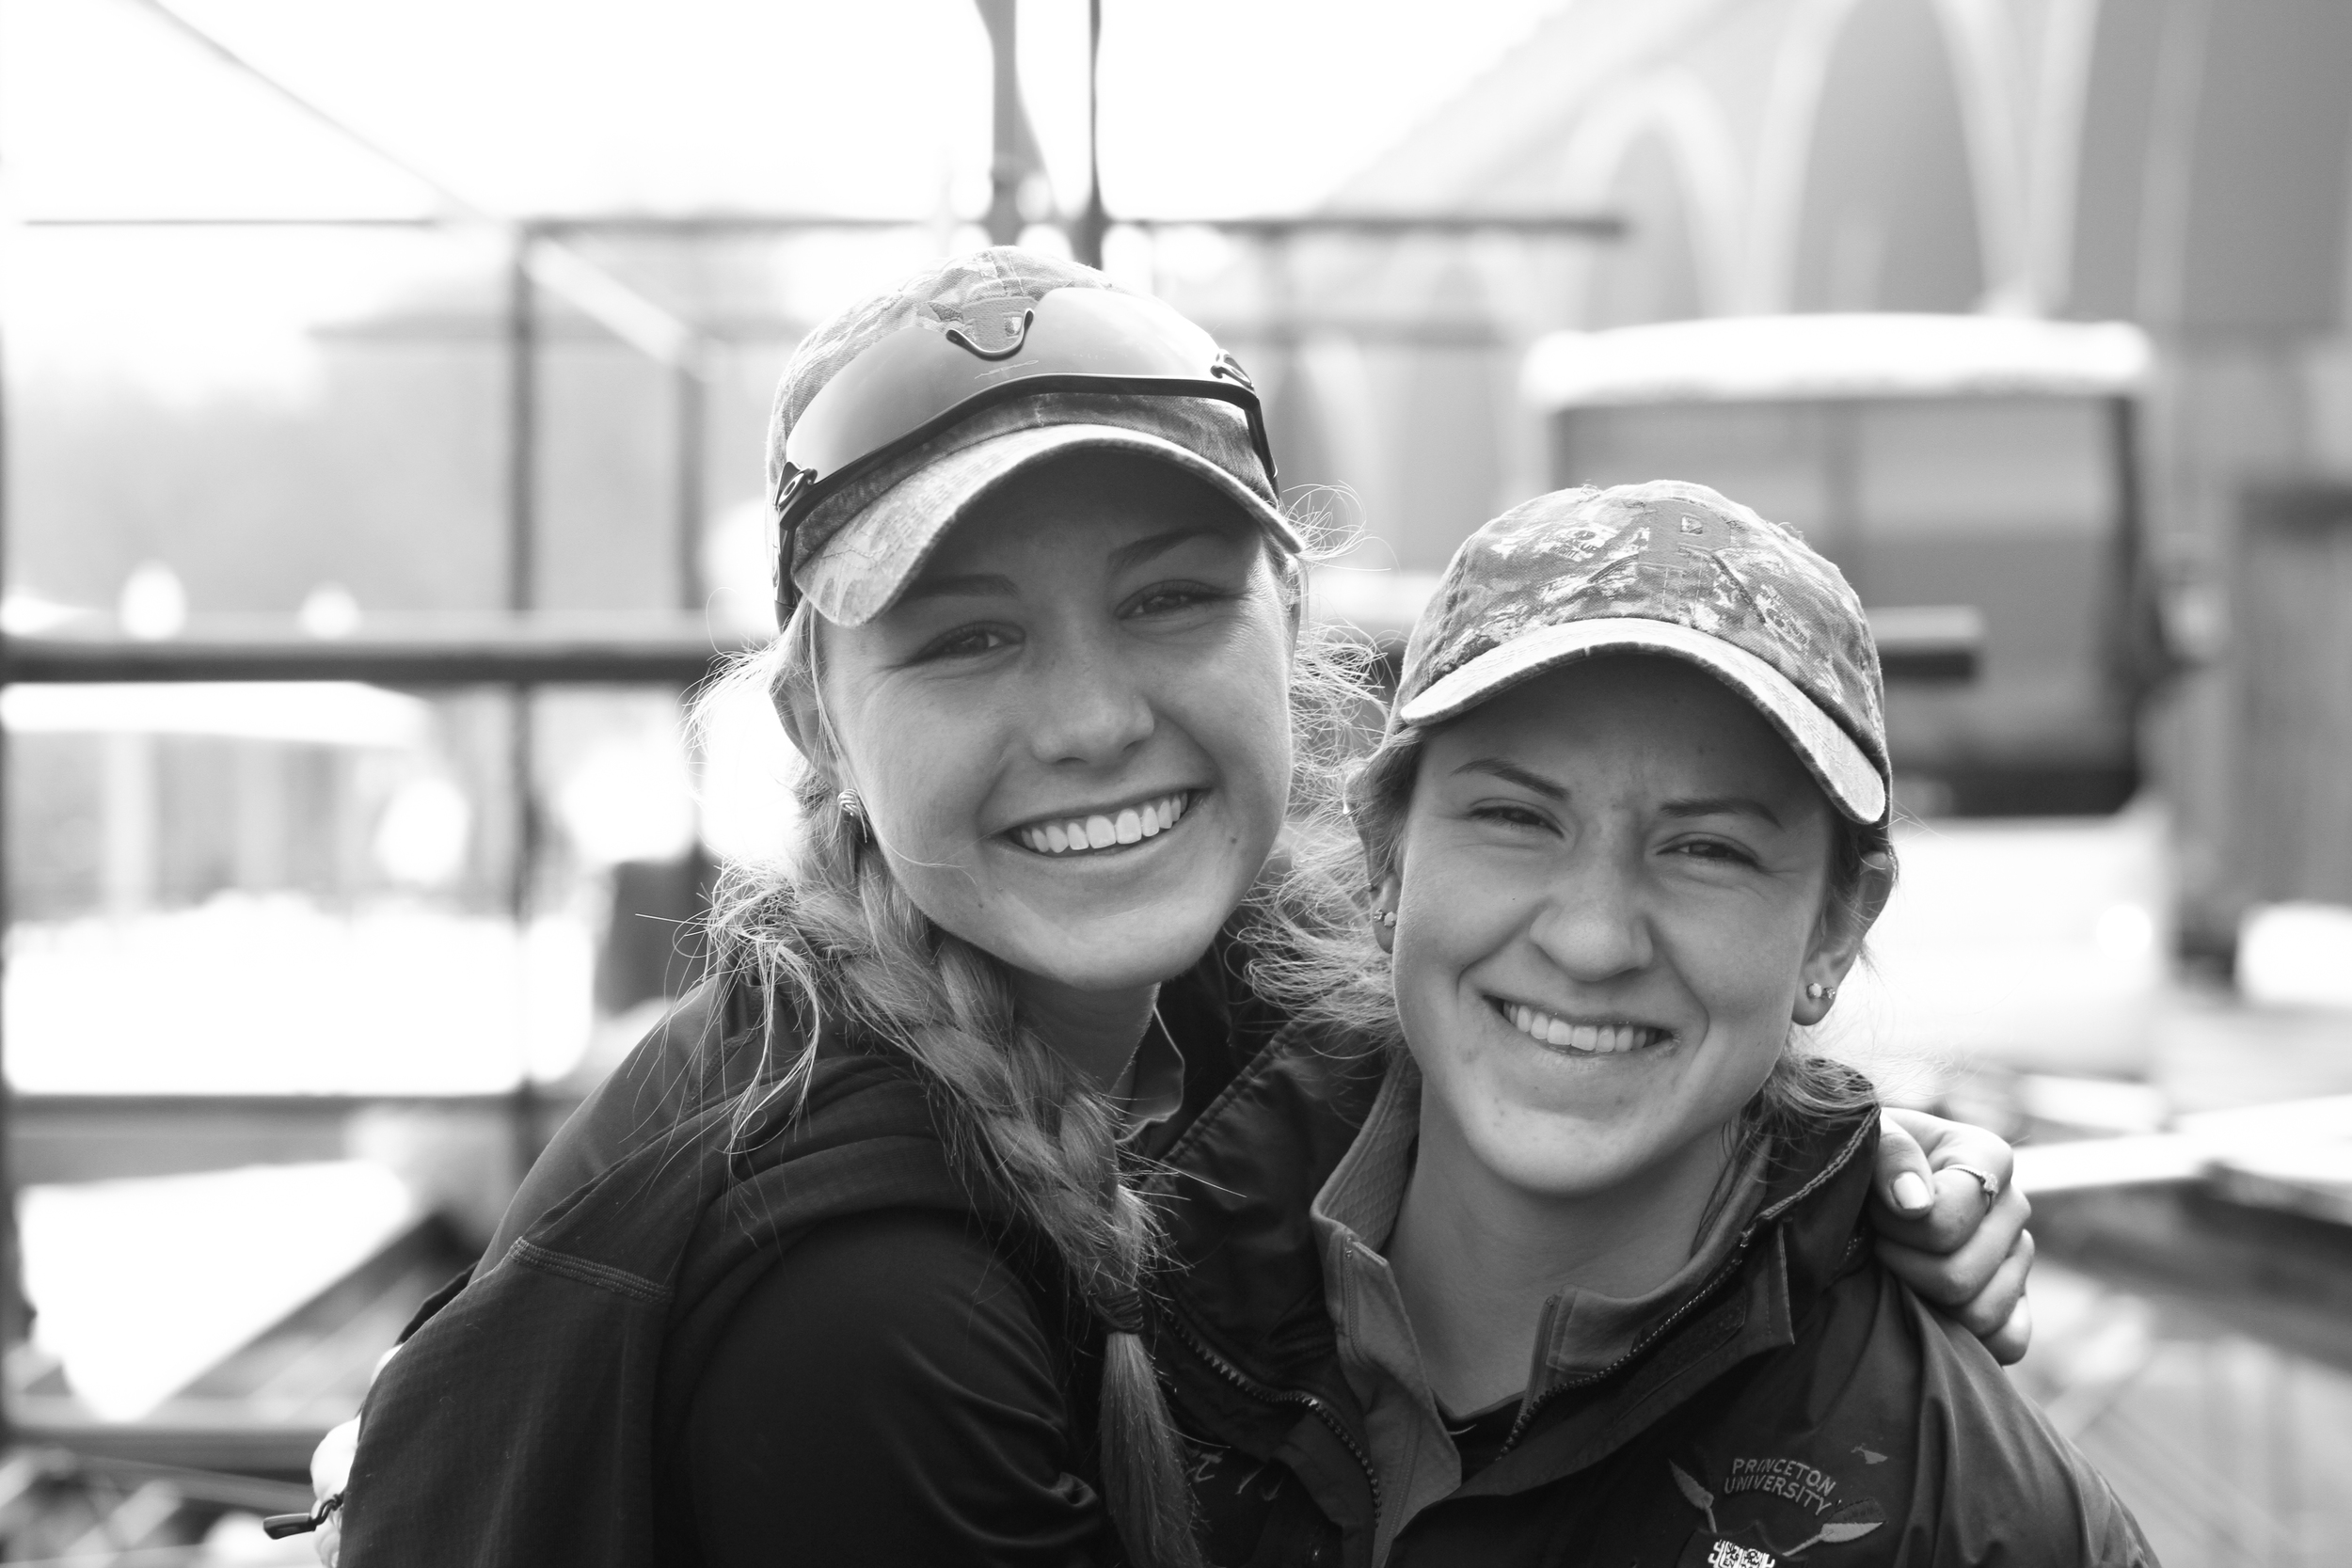 Christina Warren '17 and Juliette Hackett '17 - best of friends.